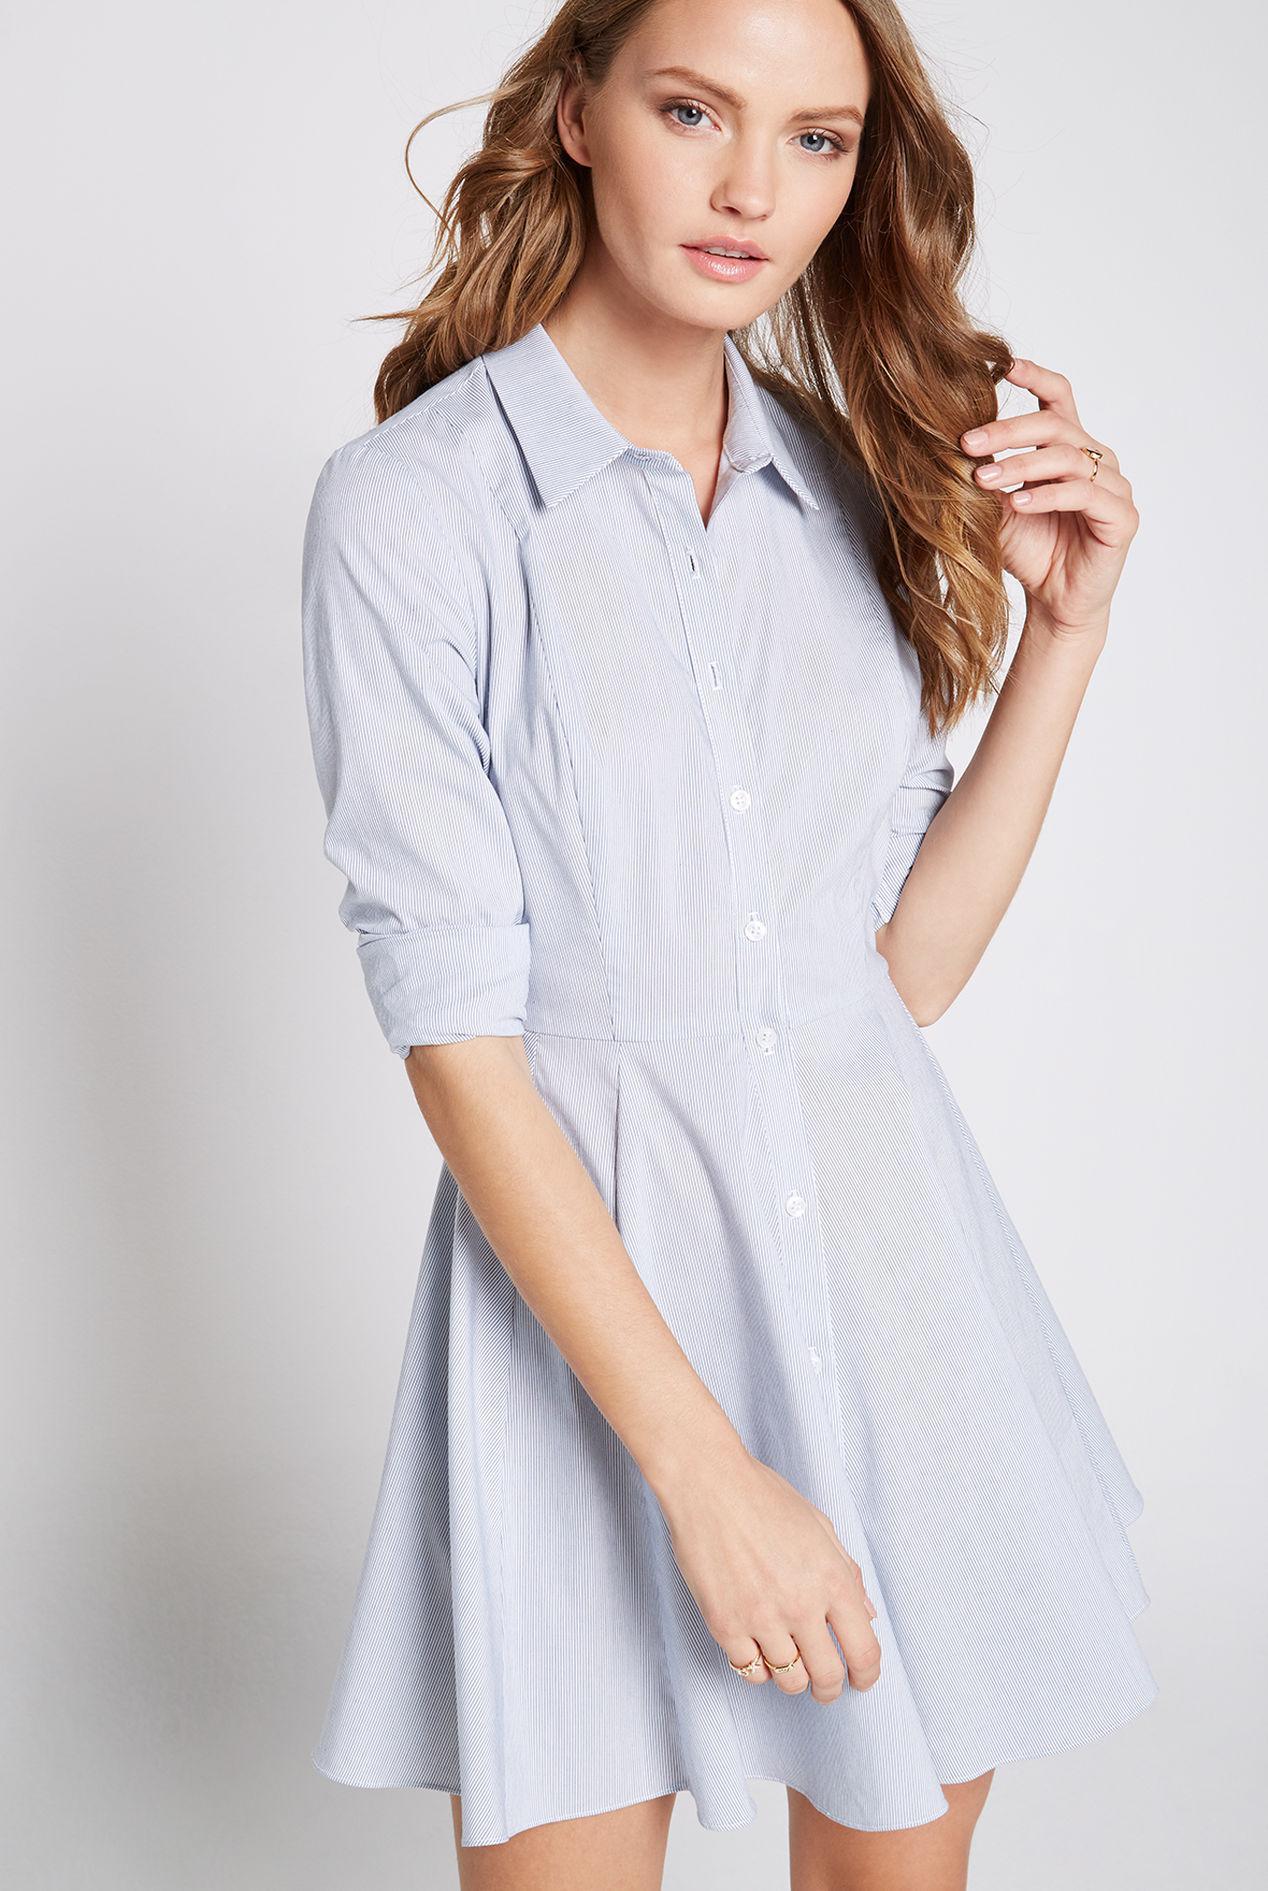 ba298778c39 Bcbgeneration Flared Button-up Shirt Dress in Blue - Lyst